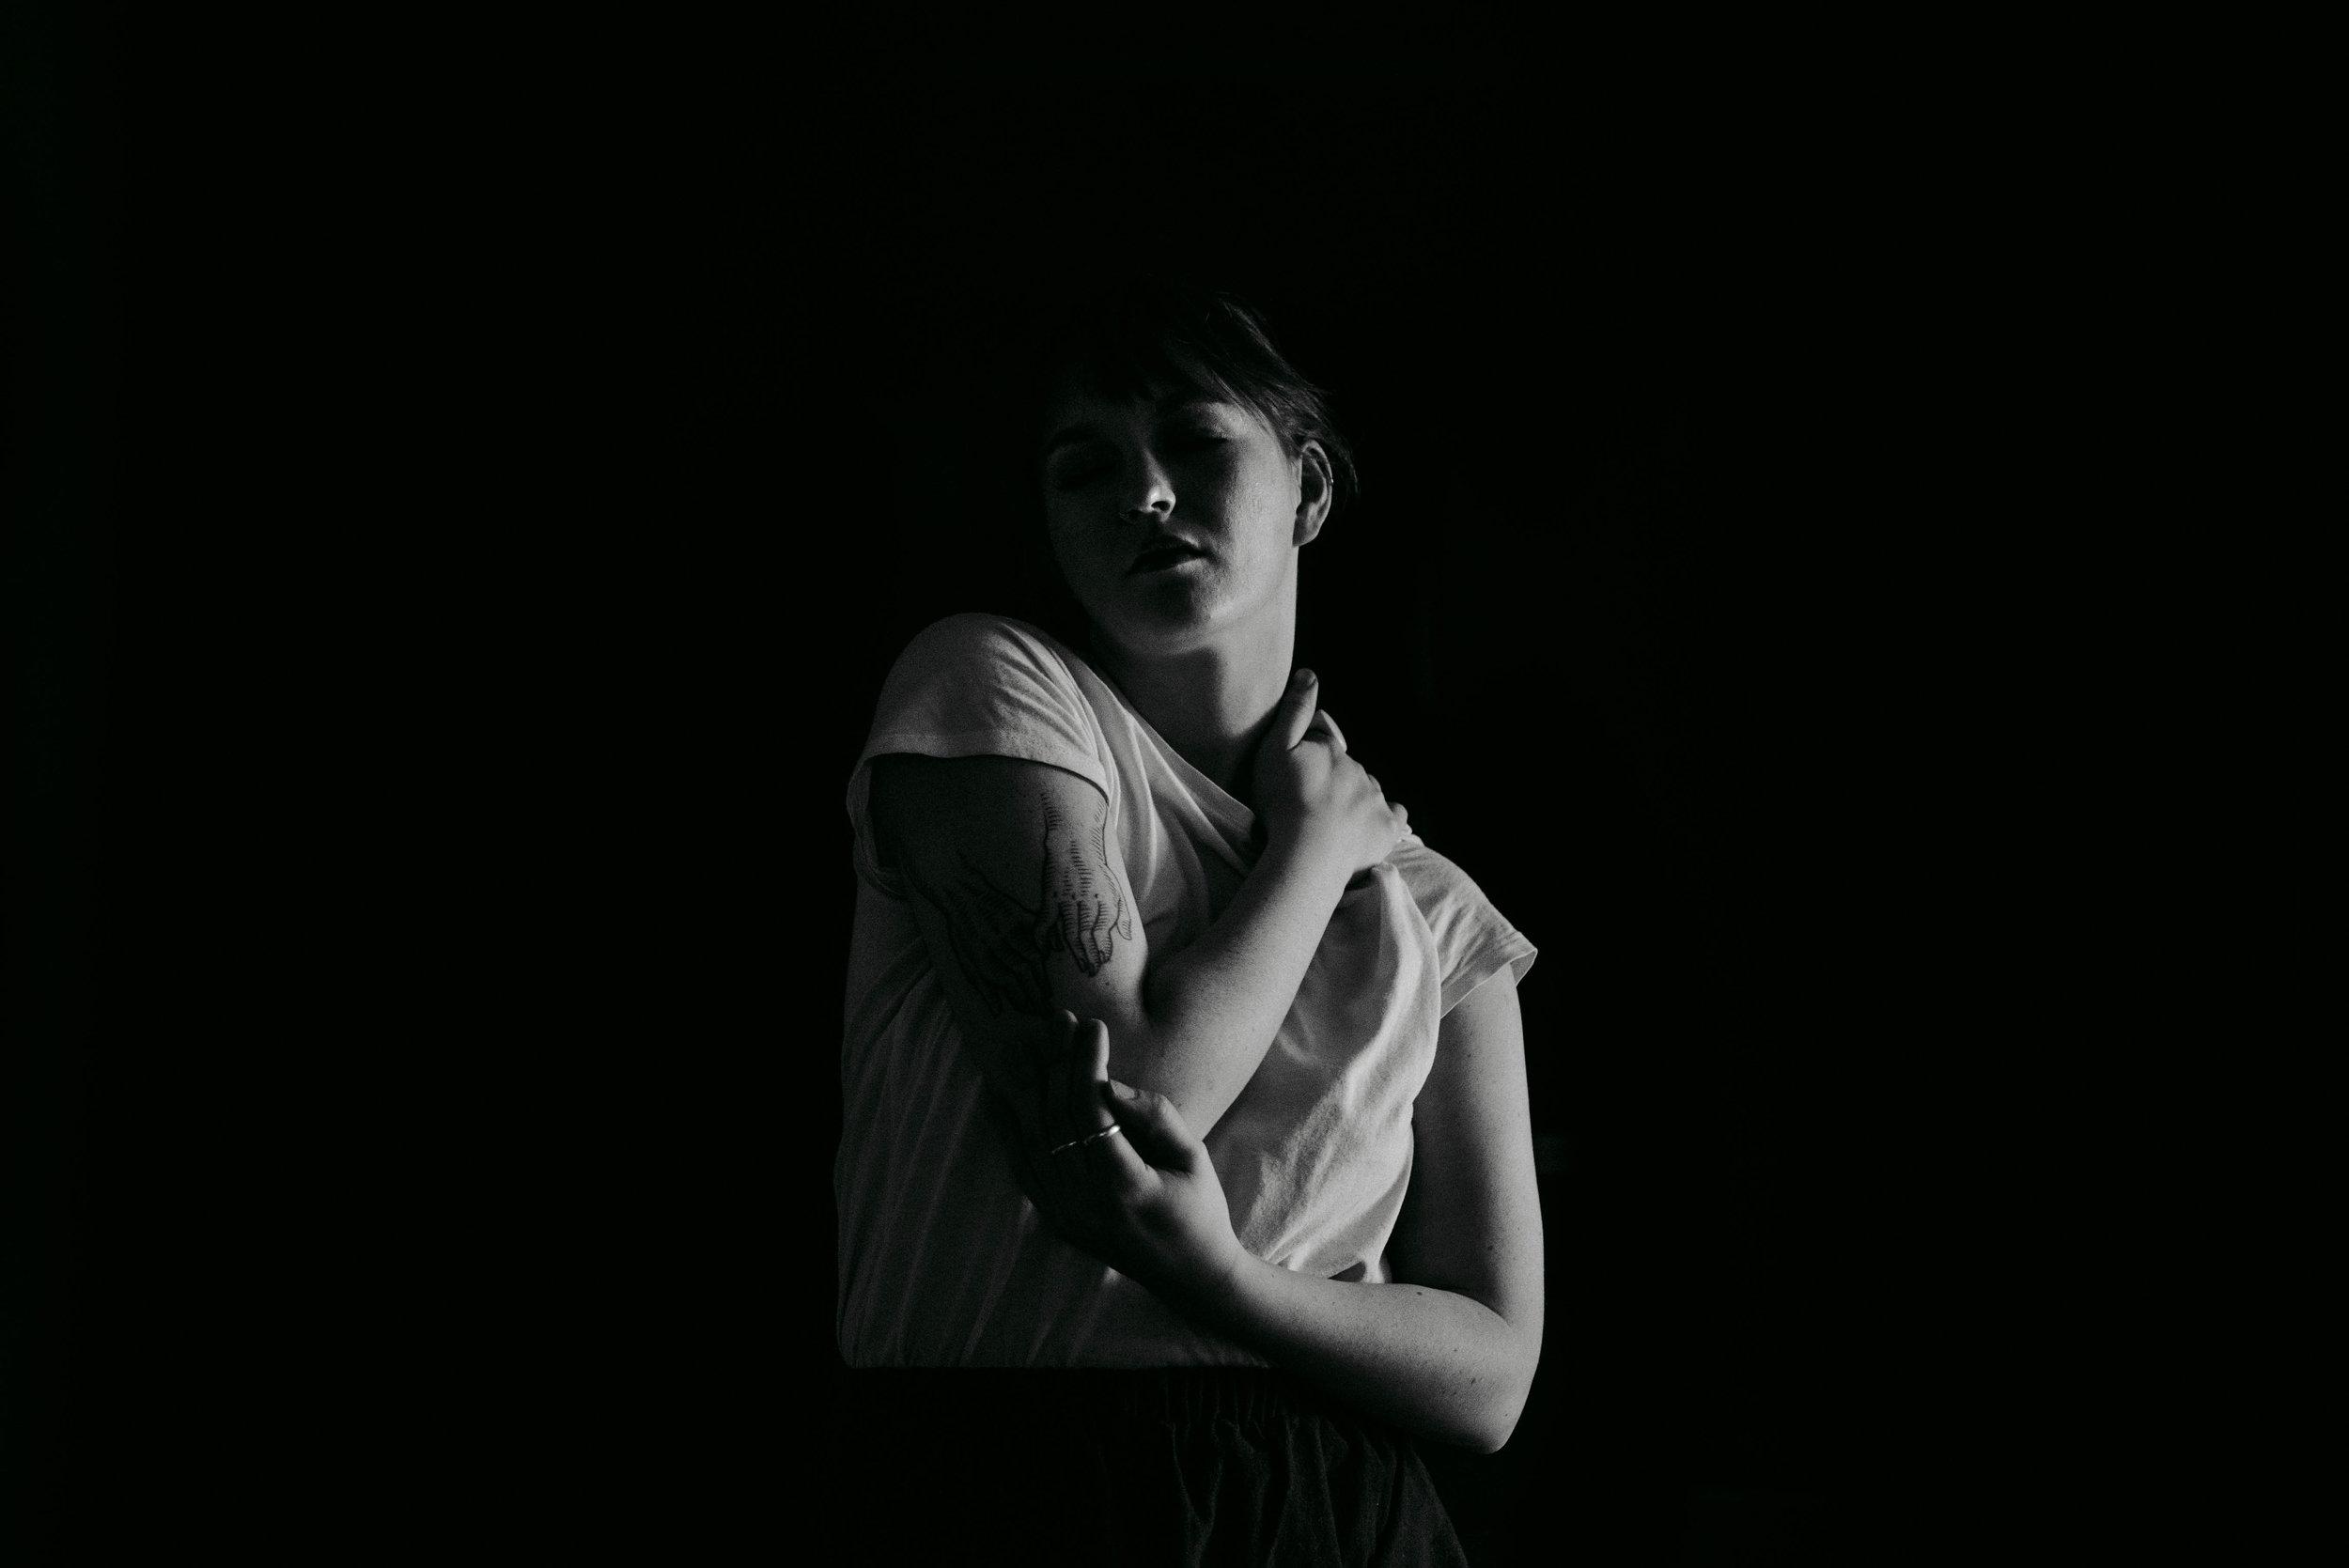 Kiandra-Jeffery-Winnipeg-Halifax-Photographer-Alex-1.jpg